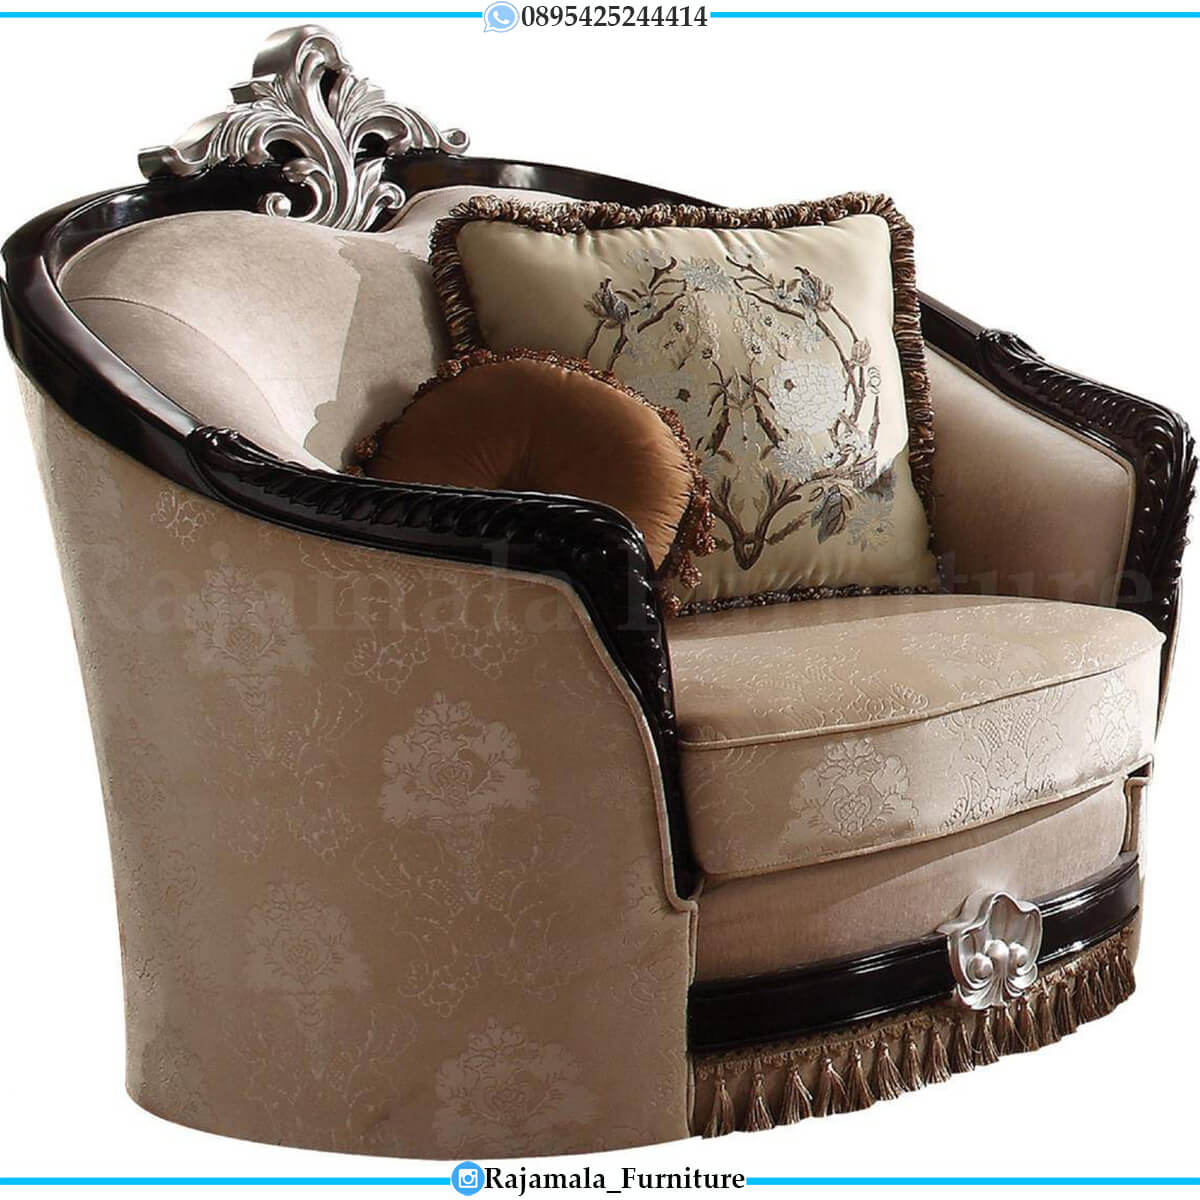 Beauty Set Sofa Tamu Mewah Terbaru Elegant Style RM-0726